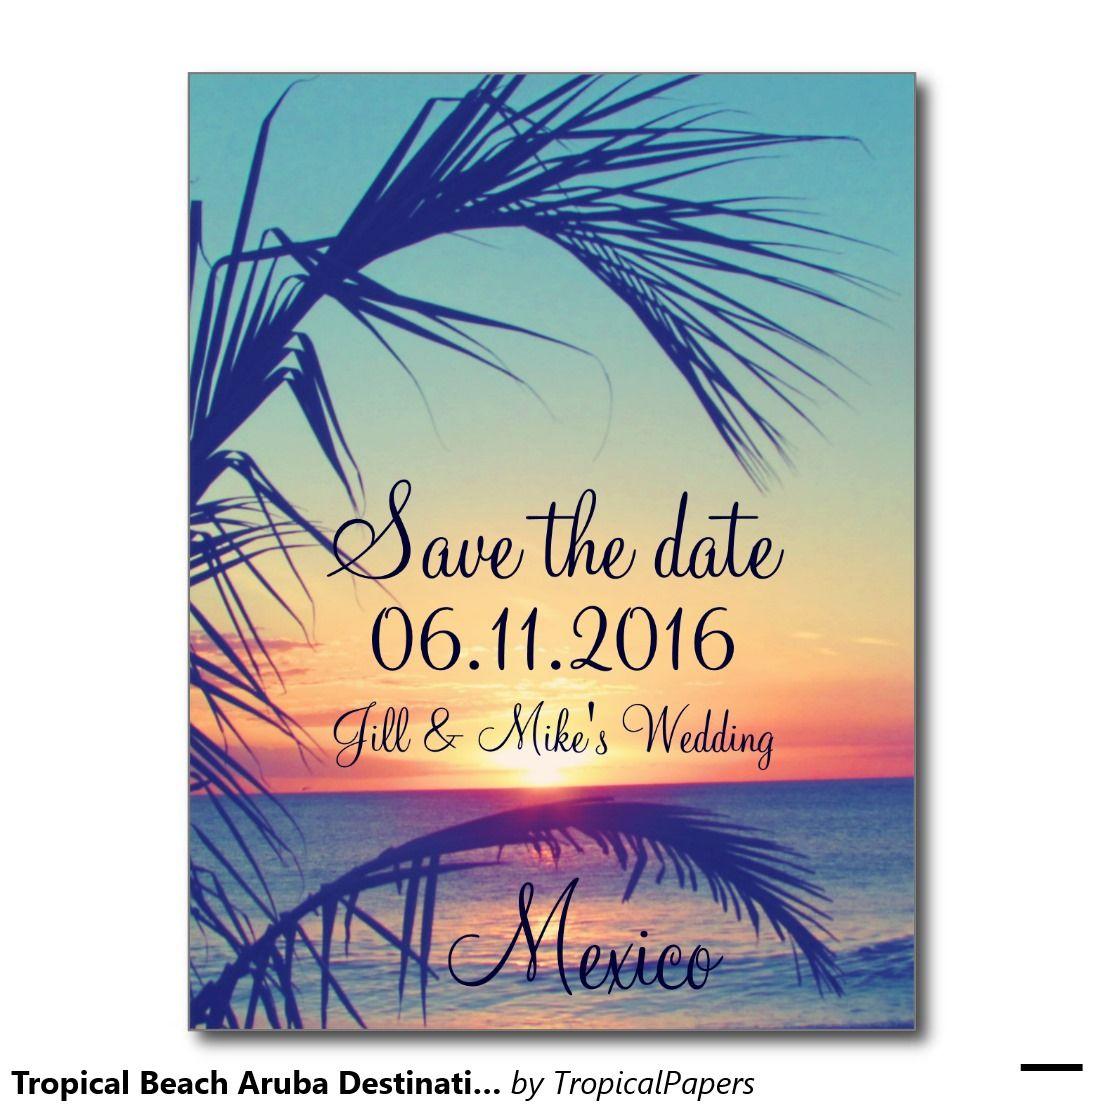 Gift Etiquette For Destination Weddings: Tropical Beach Aruba Destination Save The Date